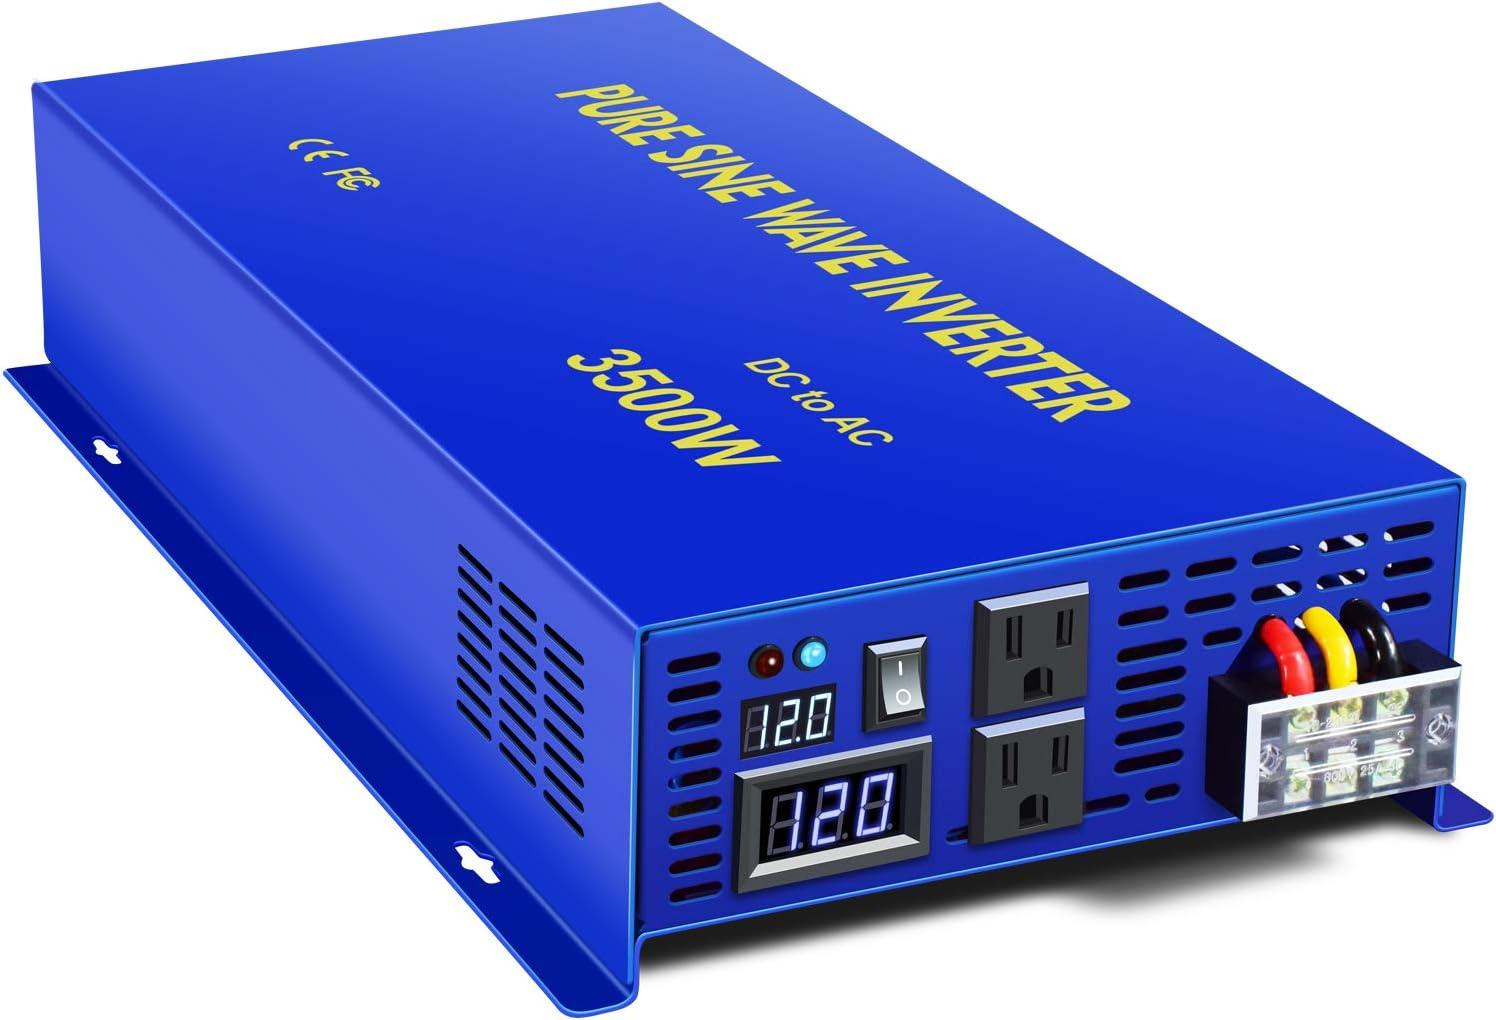 XYZ INVT Pure Sine Wave Power Inverter 3500W / 7000W (Peak) Car Caravan RV Camping Boat DC 12V Inverter Soft Start 12V DC to AC 110V DC Inverter Converter with LCD Display